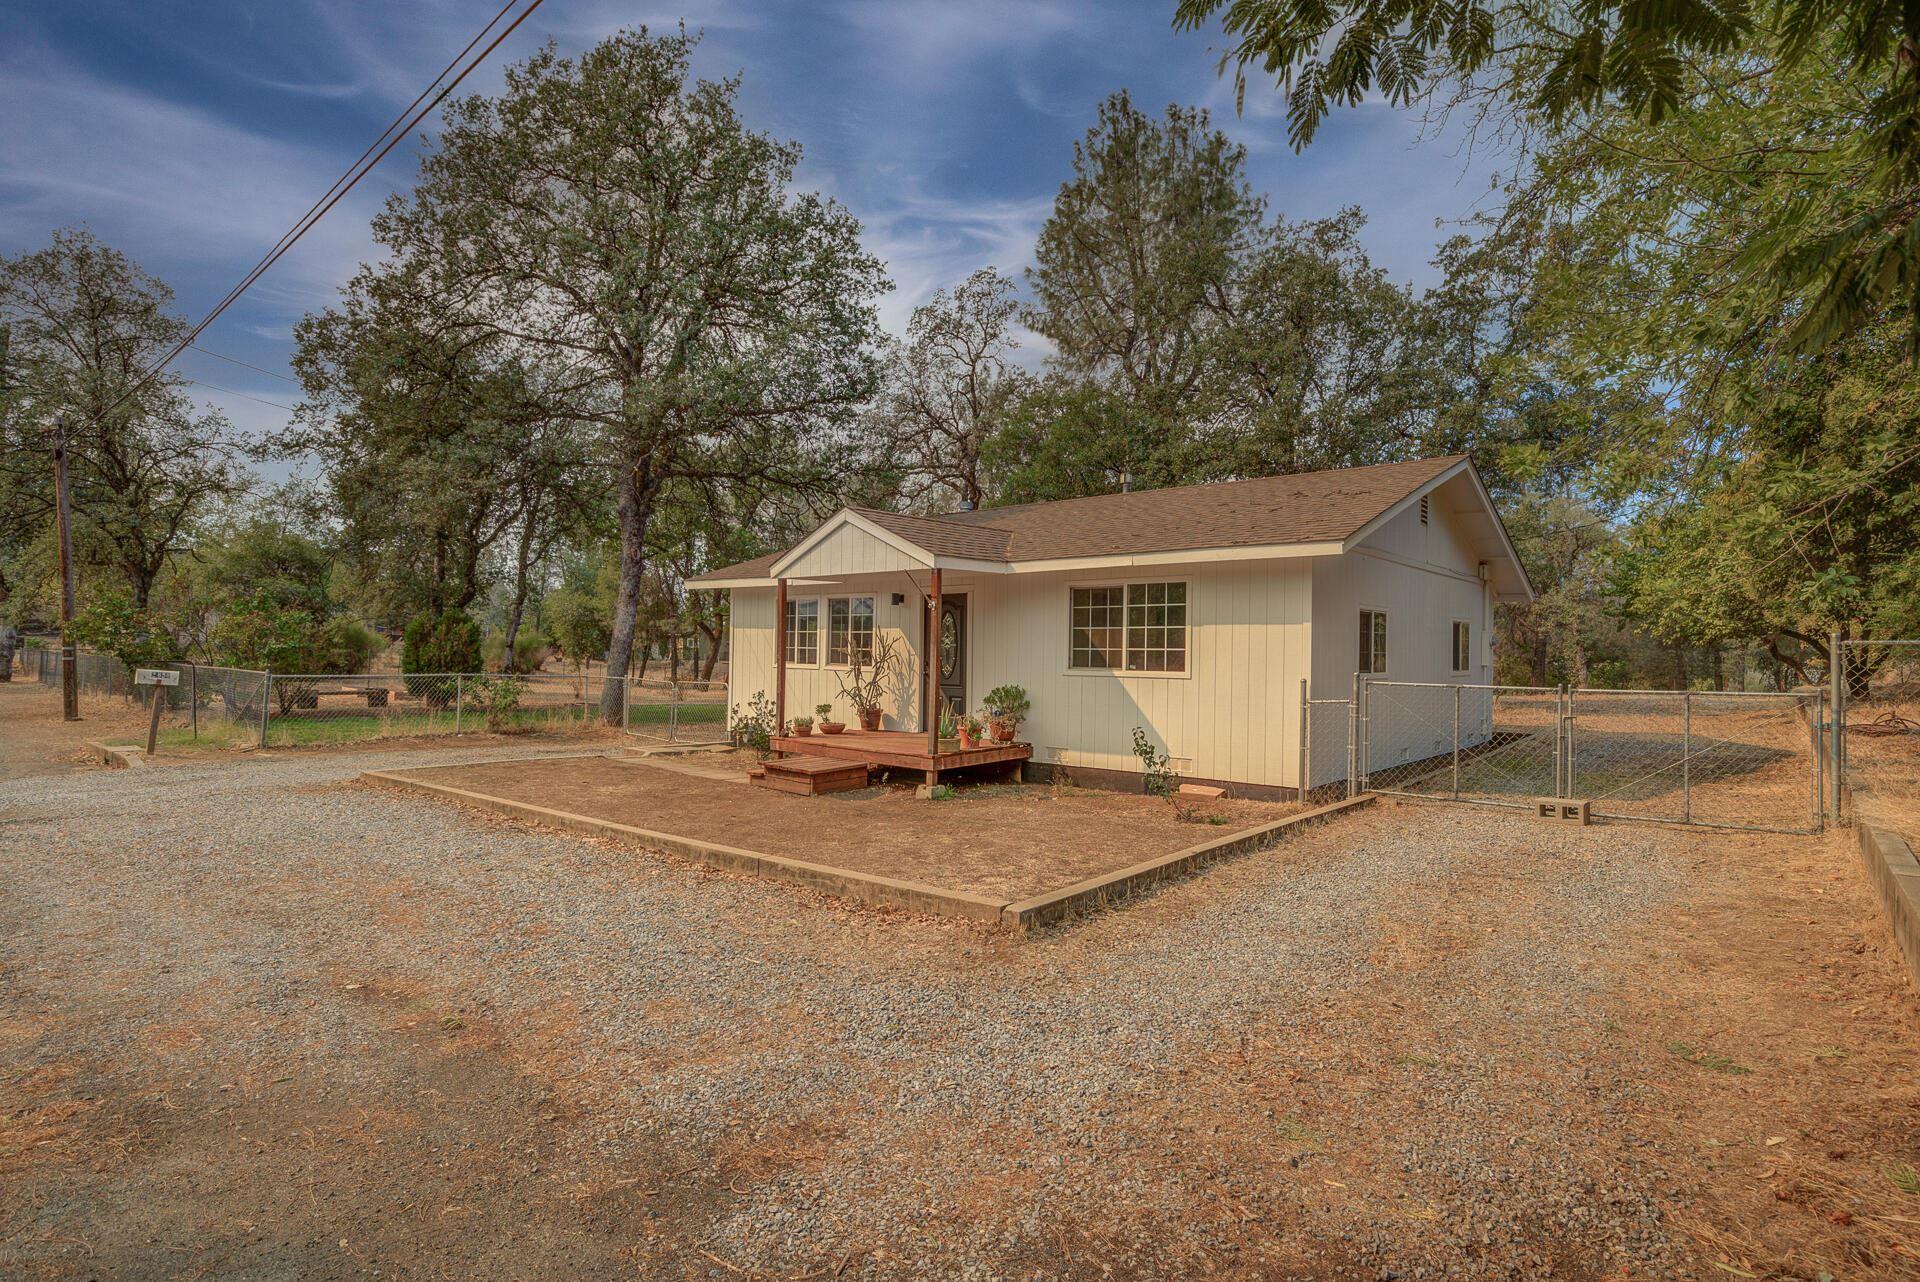 Photo for 2858 Virginia Ave, Shasta Lake, CA 96019 (MLS # 21-4574)